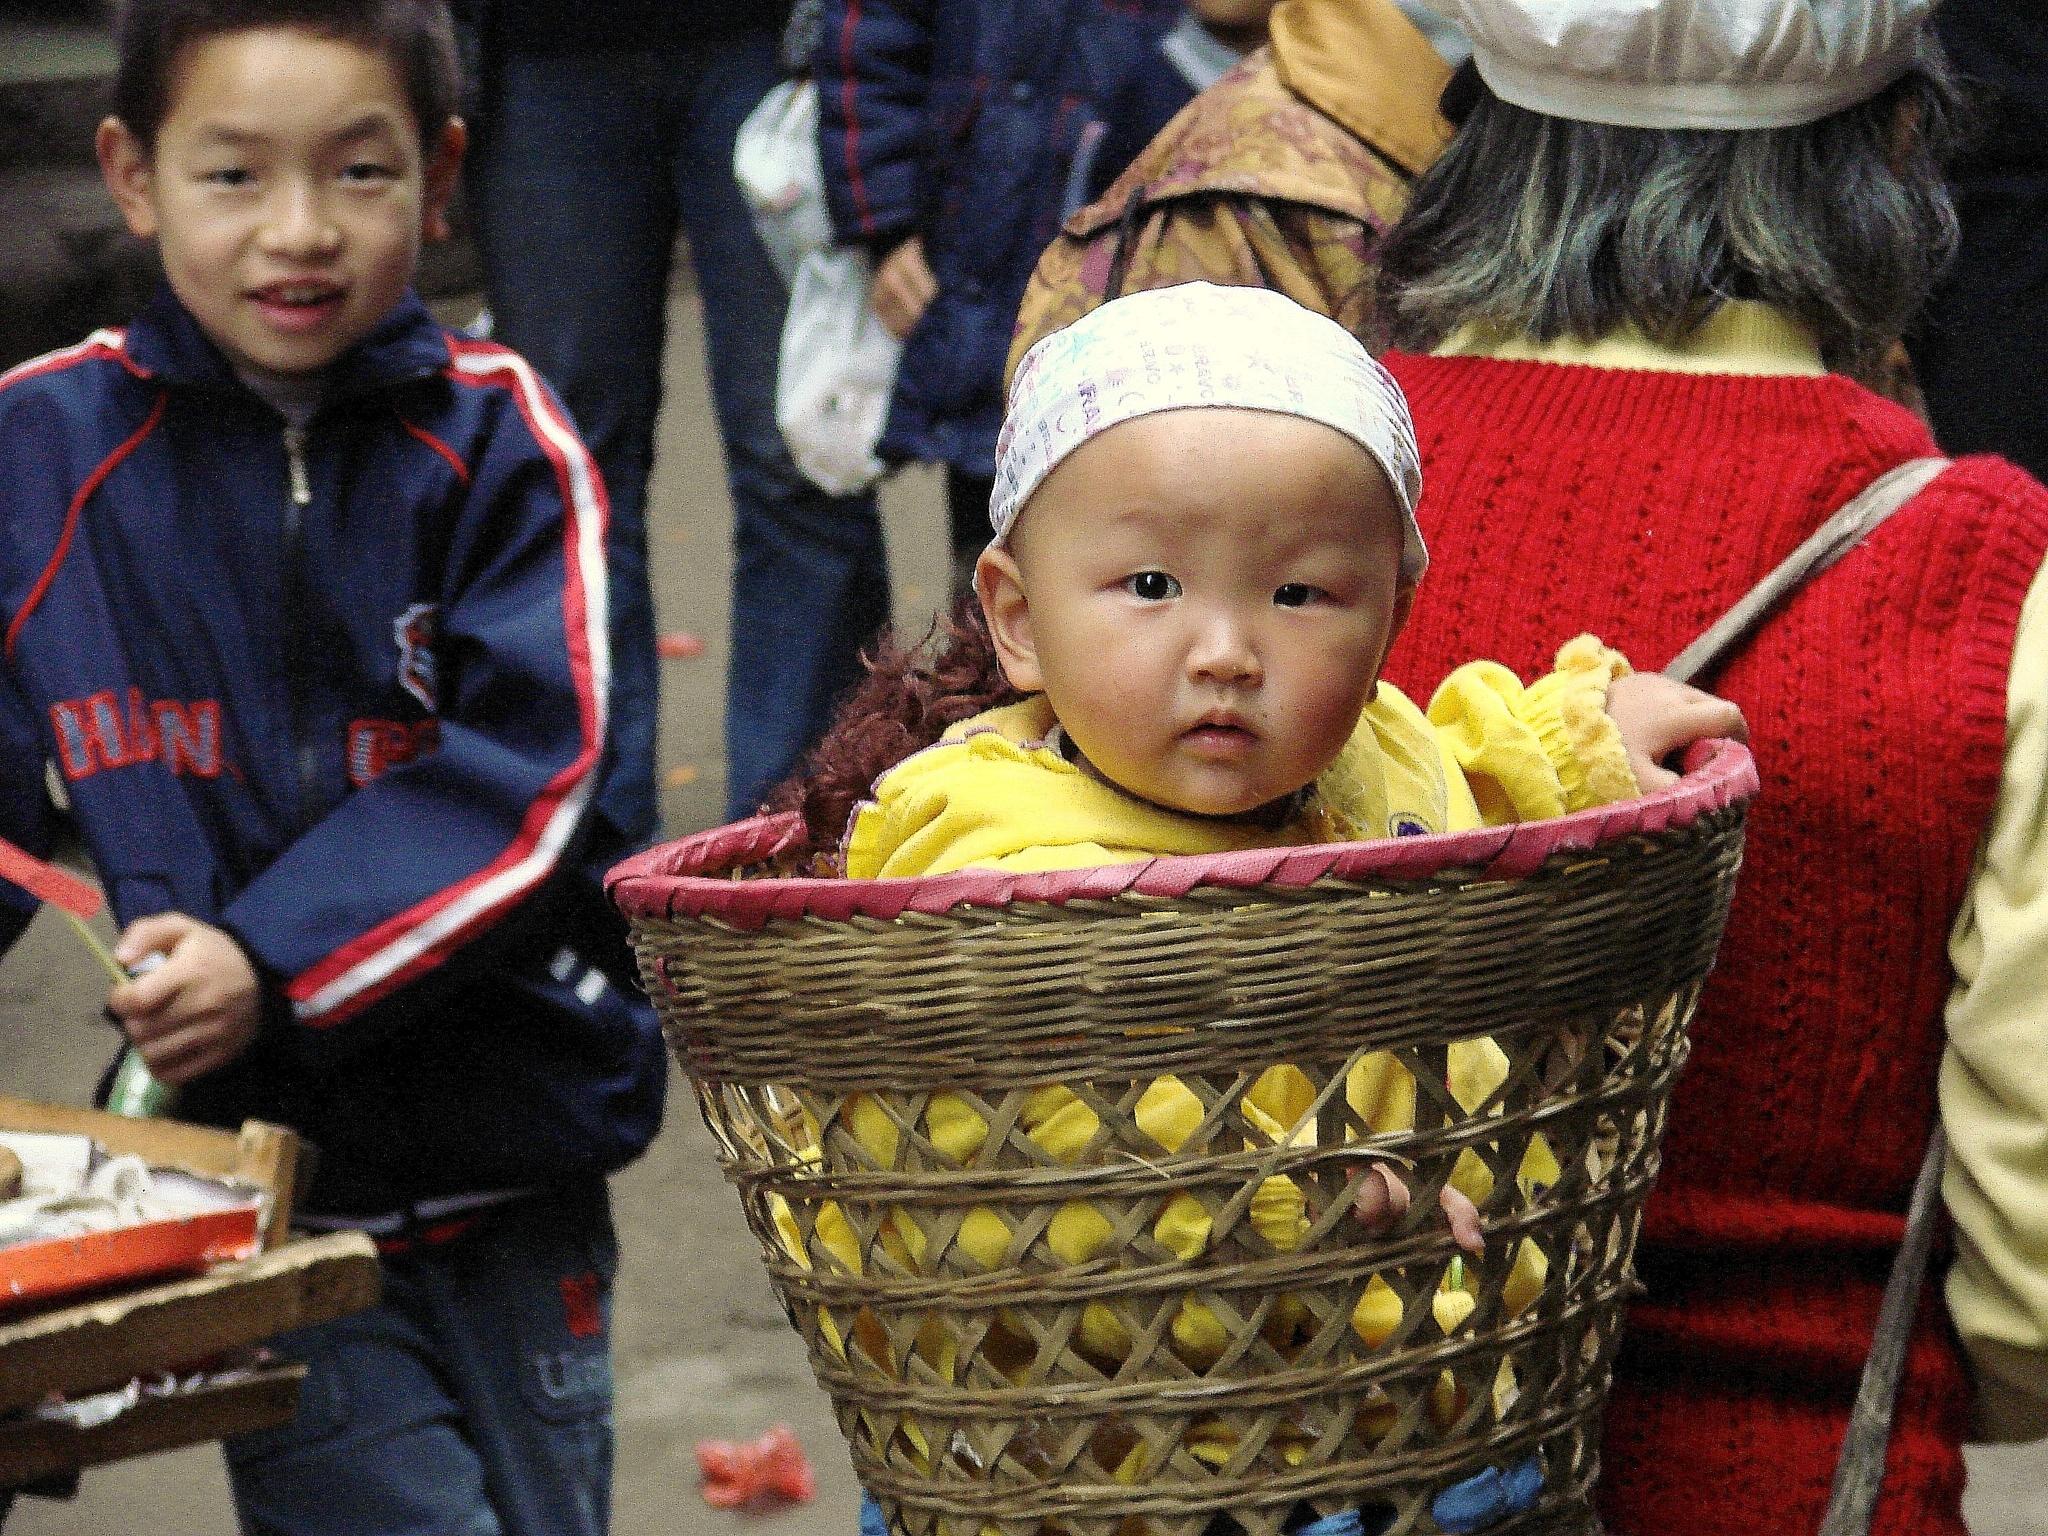 Baby in a Basket by GregKnudsen